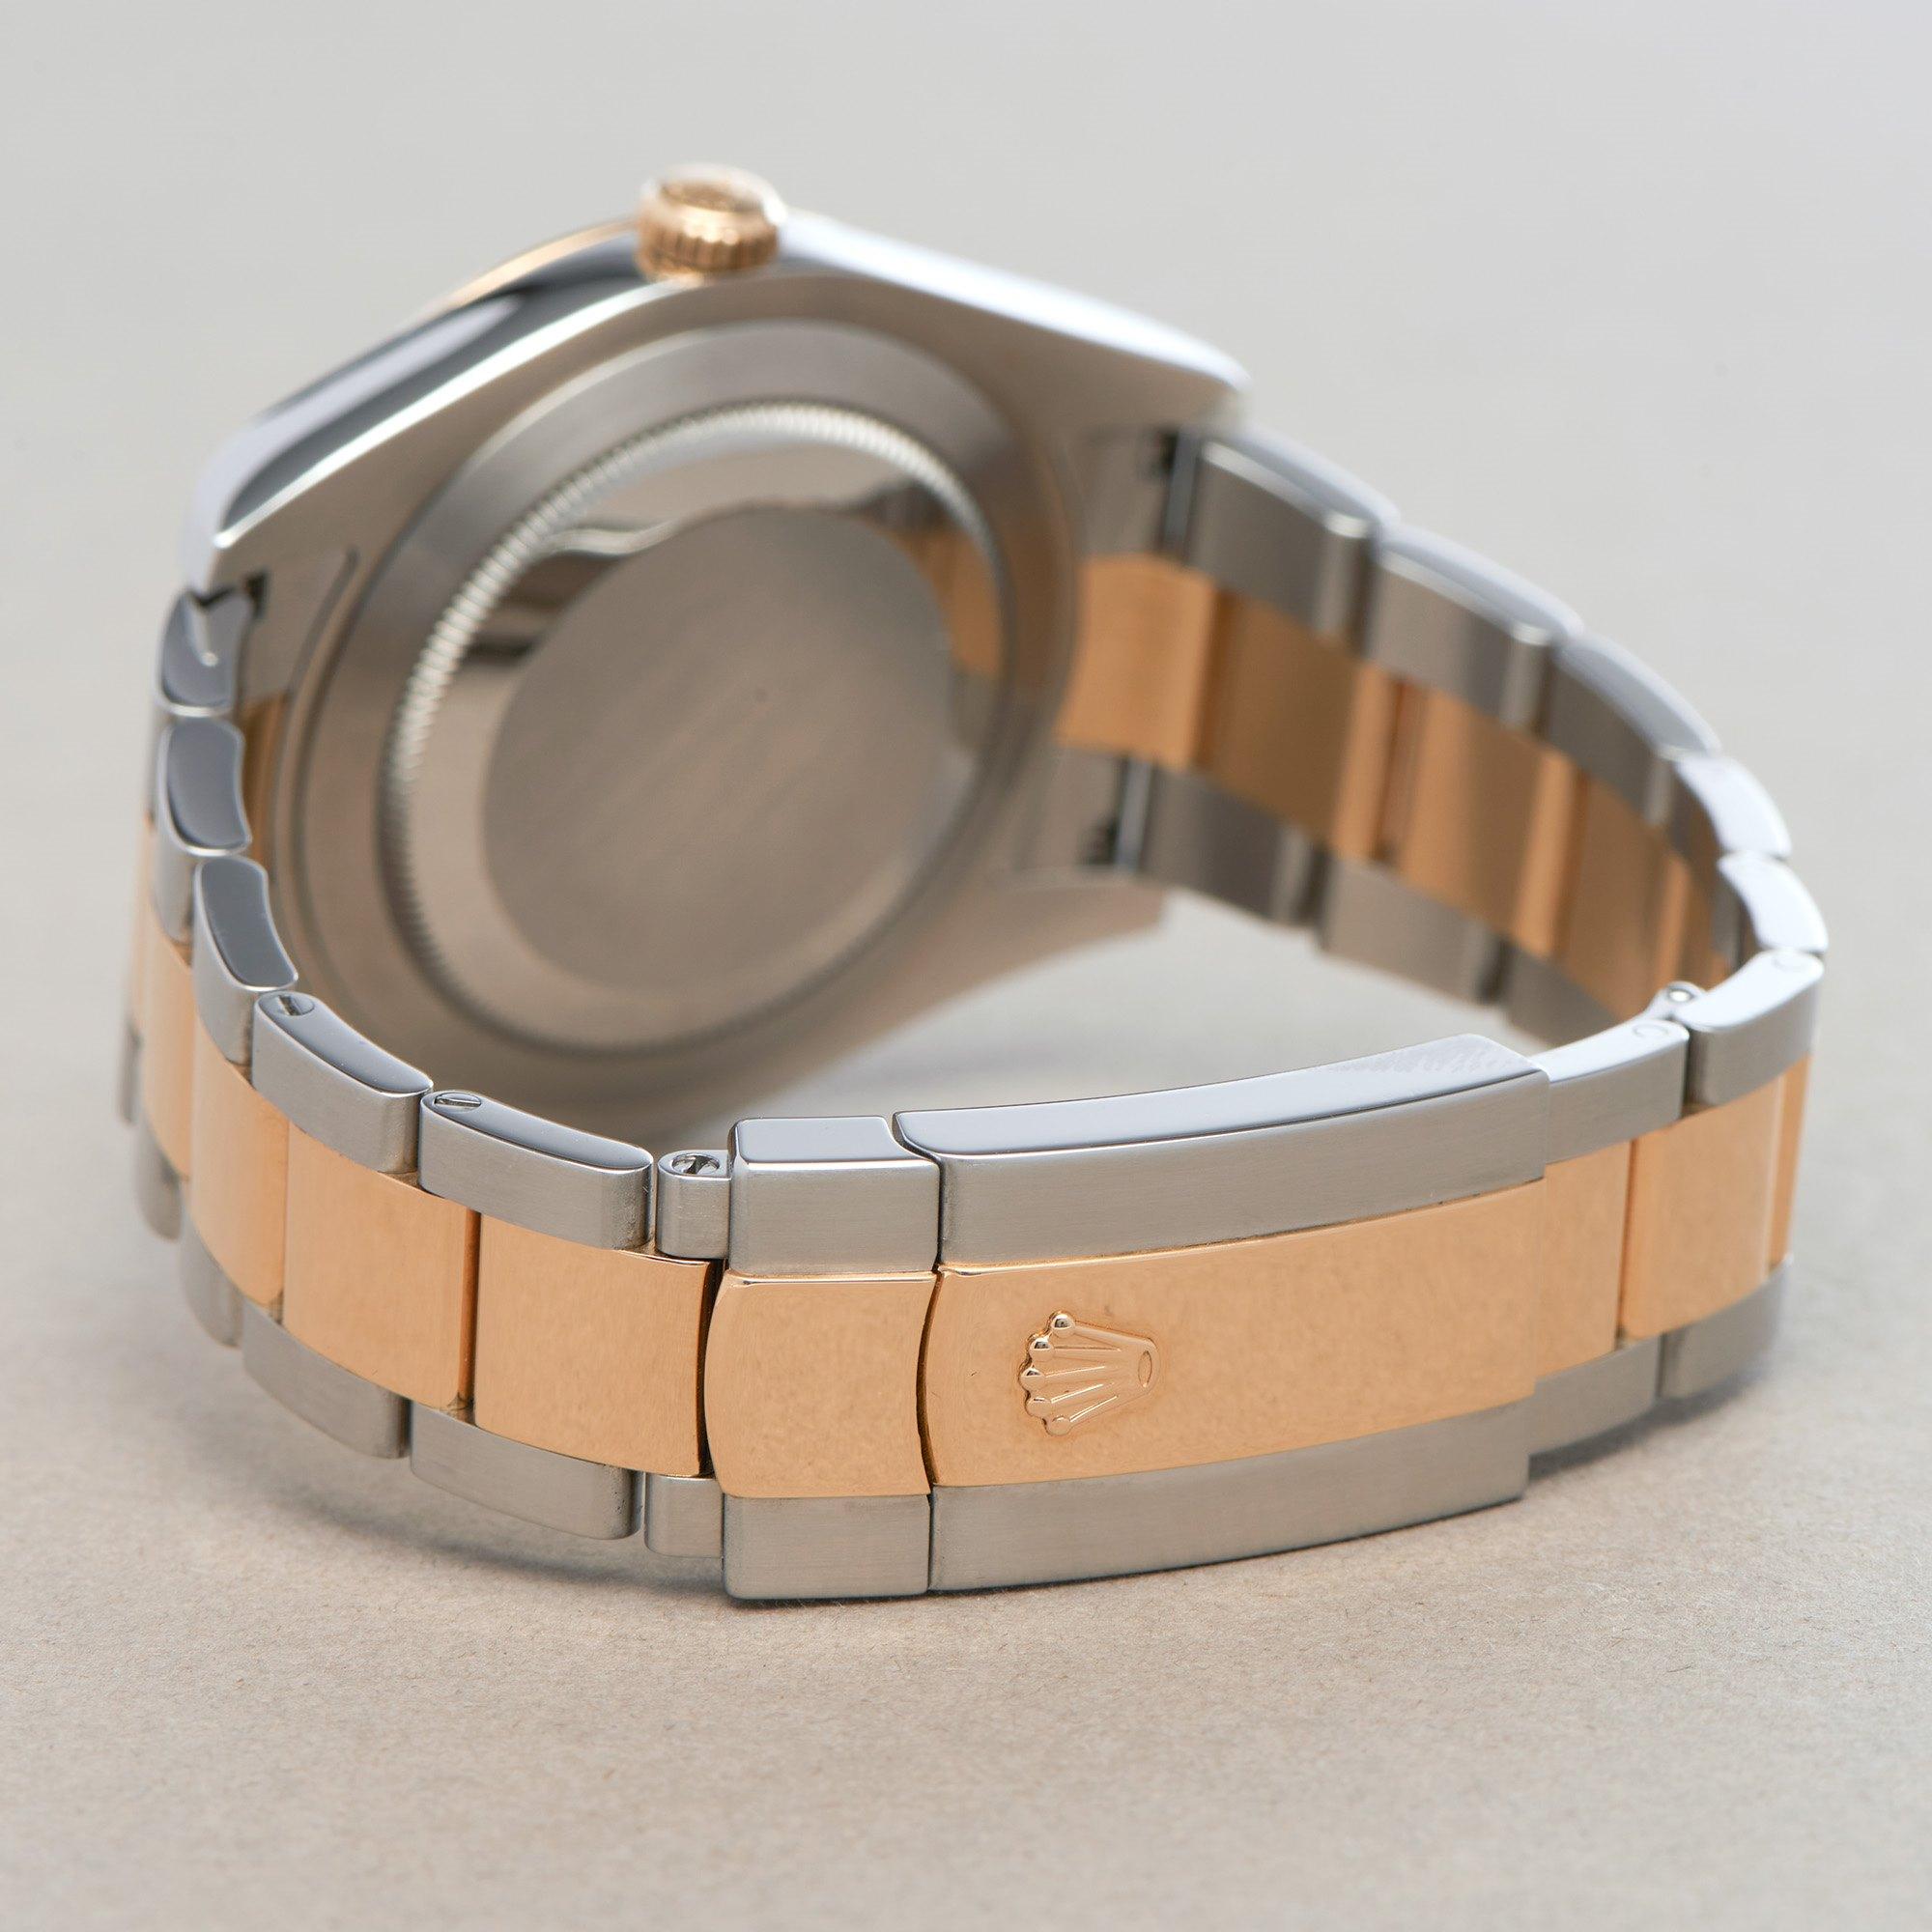 Rolex Datejust 41 18K Stainless Steel 116333